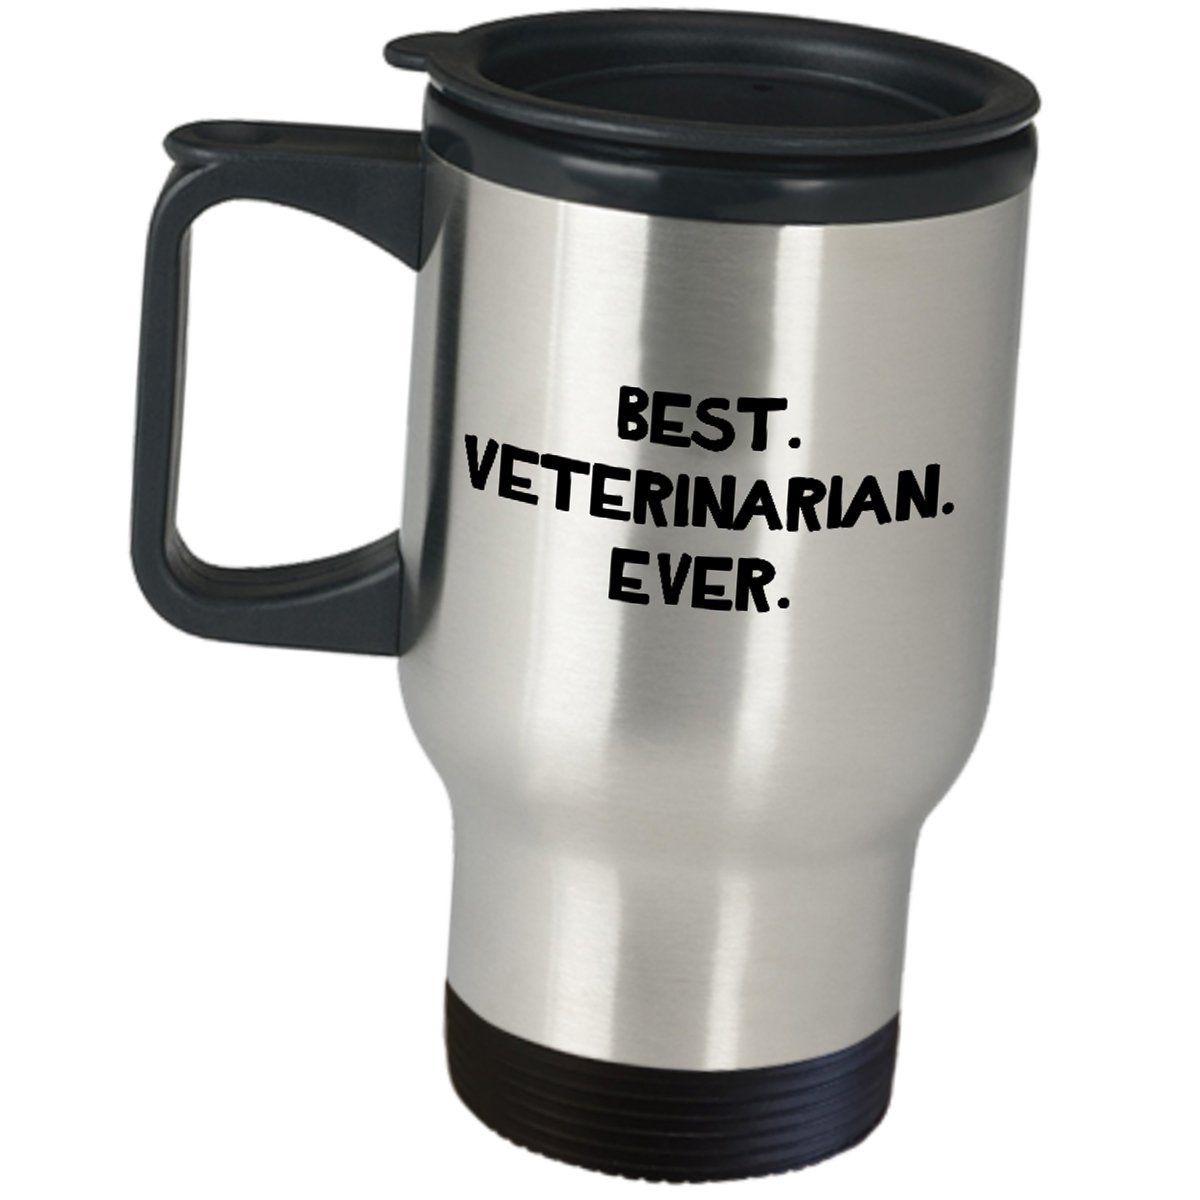 Vet Coffee Tumbler Funny Gifts - Best Veterinarian Ever Travel Mug - Doctor of Veterinary Medicine Pet Dog Cat Animal Physiology Graduation Cute Gag Gift